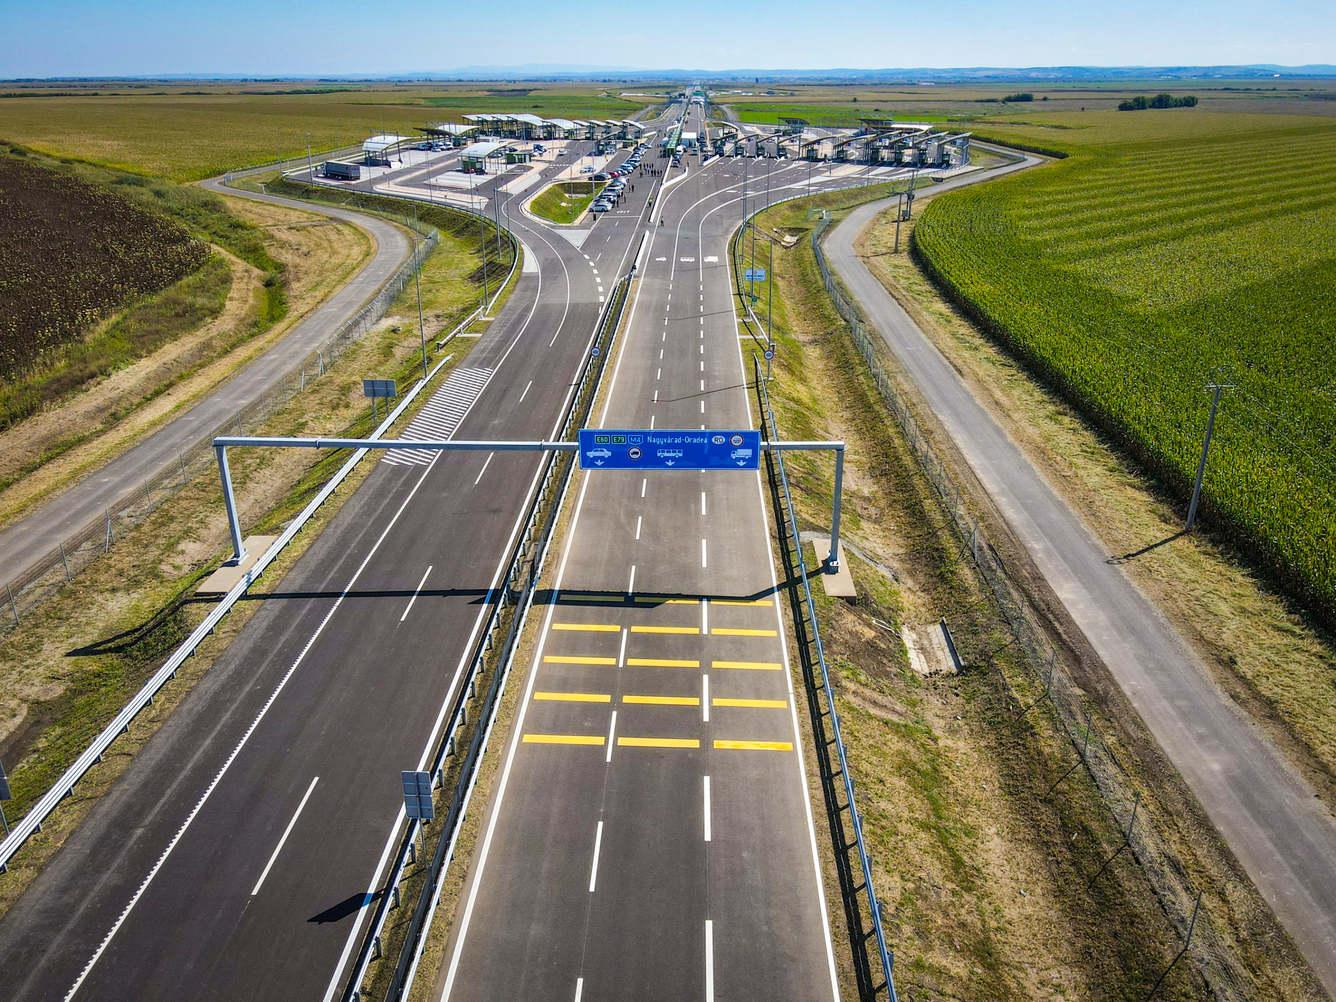 FOTO: Inaugurare autostrada Biharia - Borș și Vama Borș II 04.09.2020